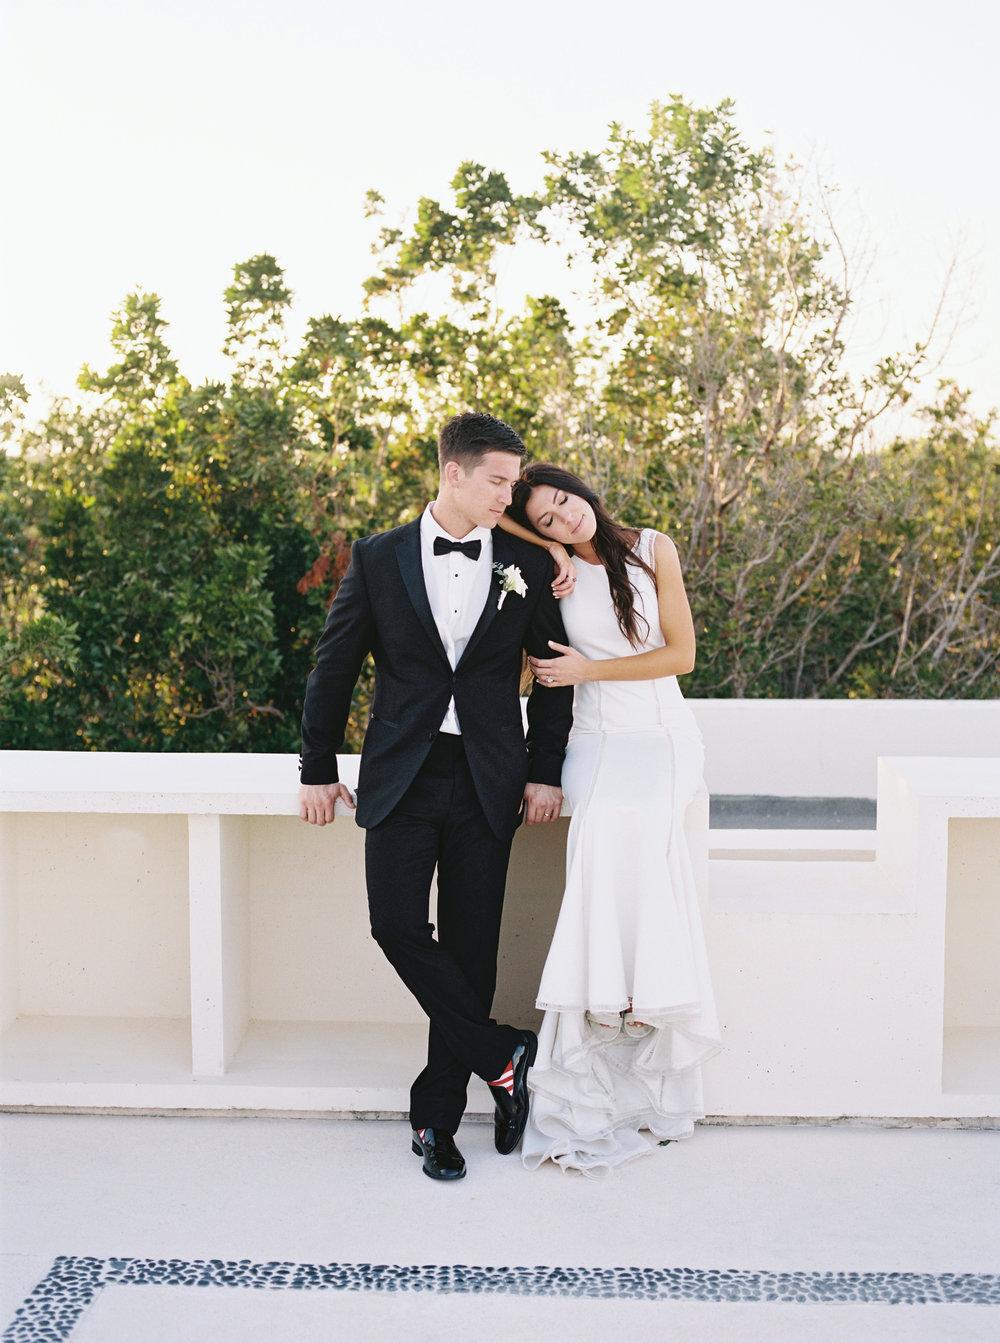 Kyle John l Fine Art Wedding Photography l Chicago, Copenhagen, California, New York, Destination l Blog l Brooke Boyd_The Film Poets_Tulum Wedding_33